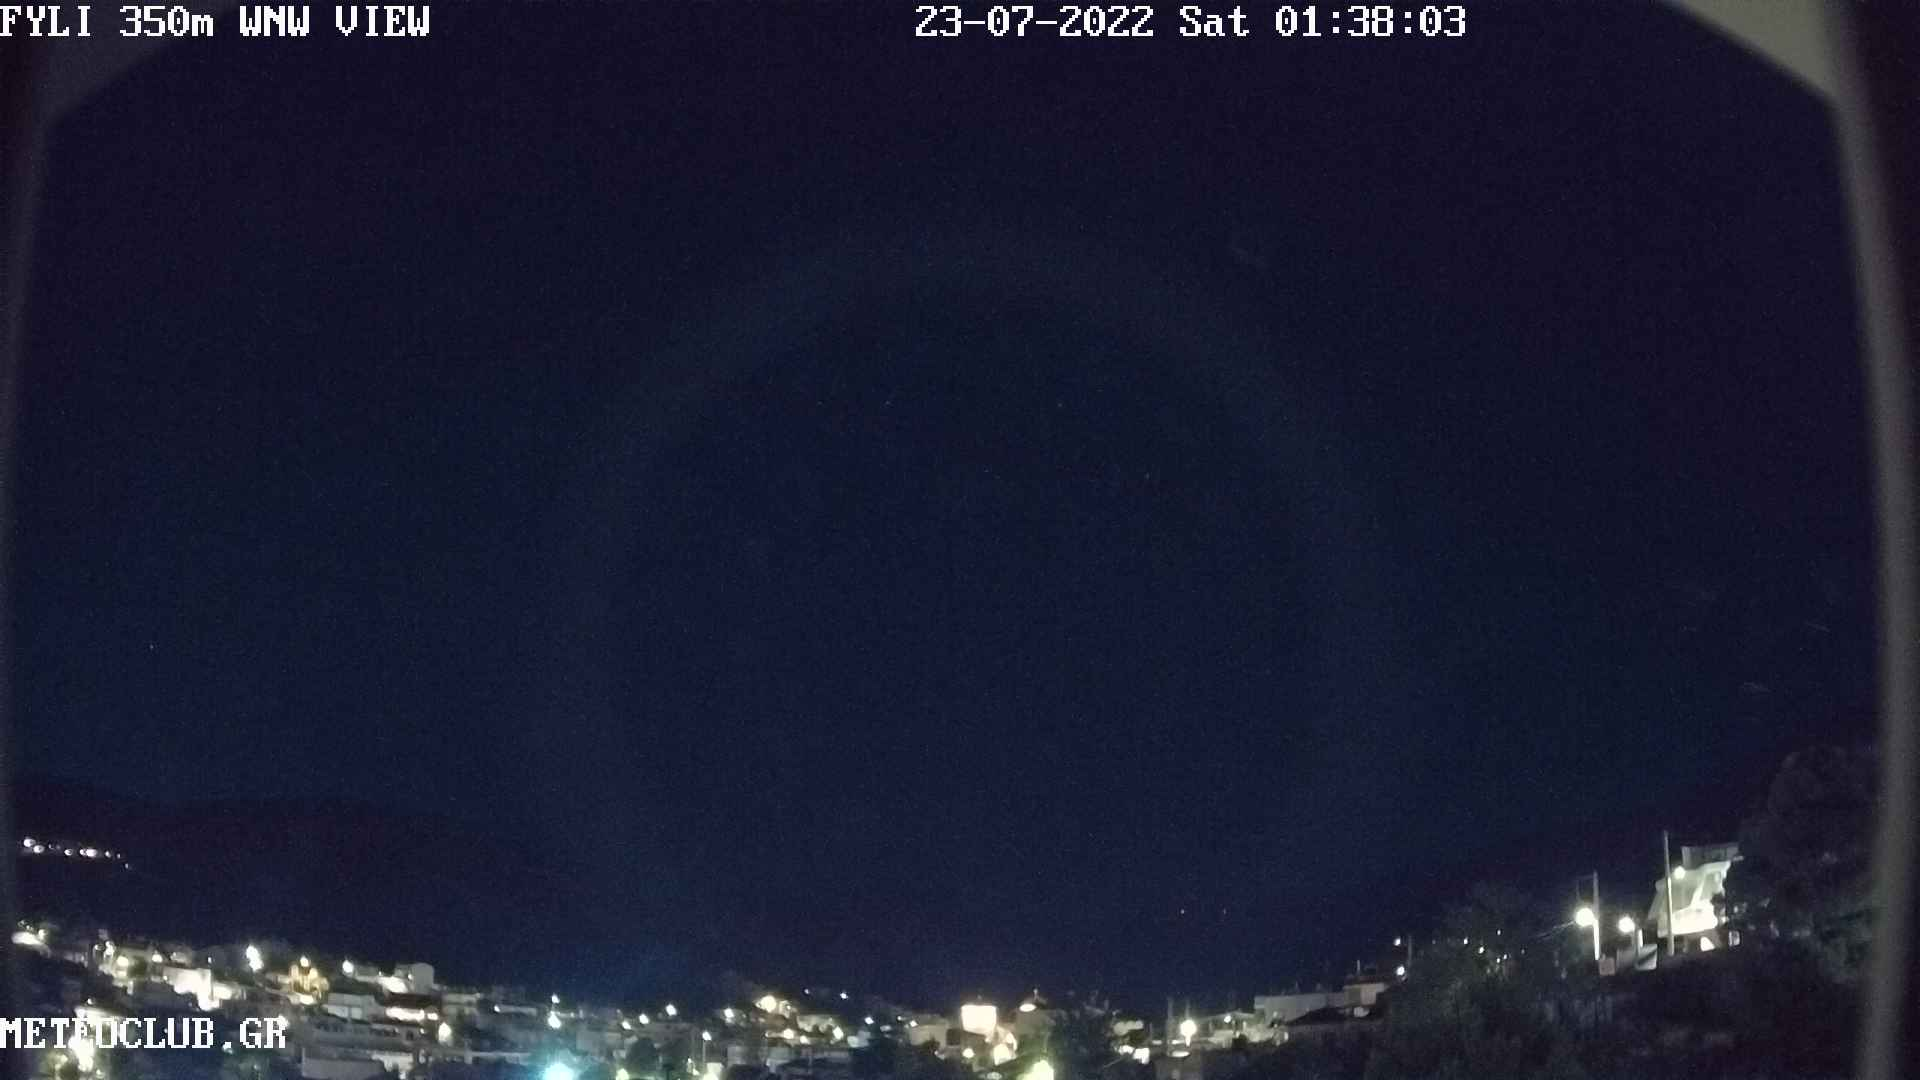 Webcam Φυλή Αττικής